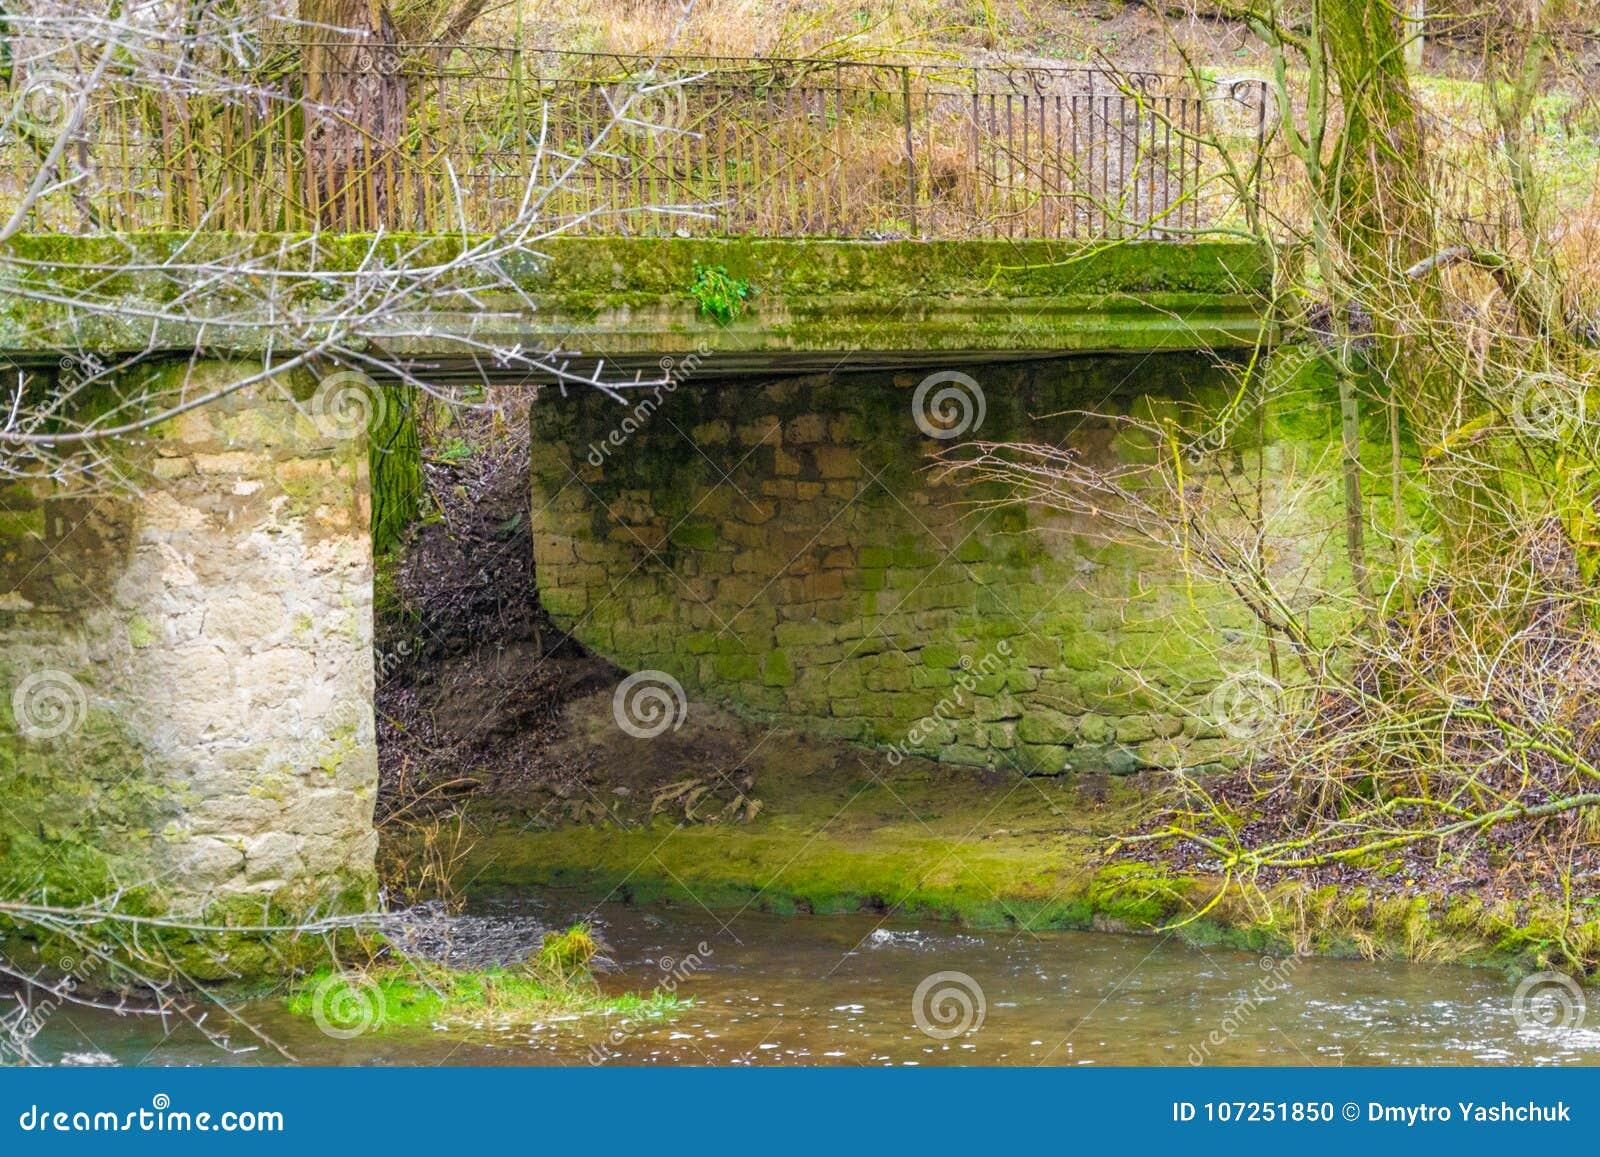 Изображение берега реки моста Hisley старый мост packhorse над рекой